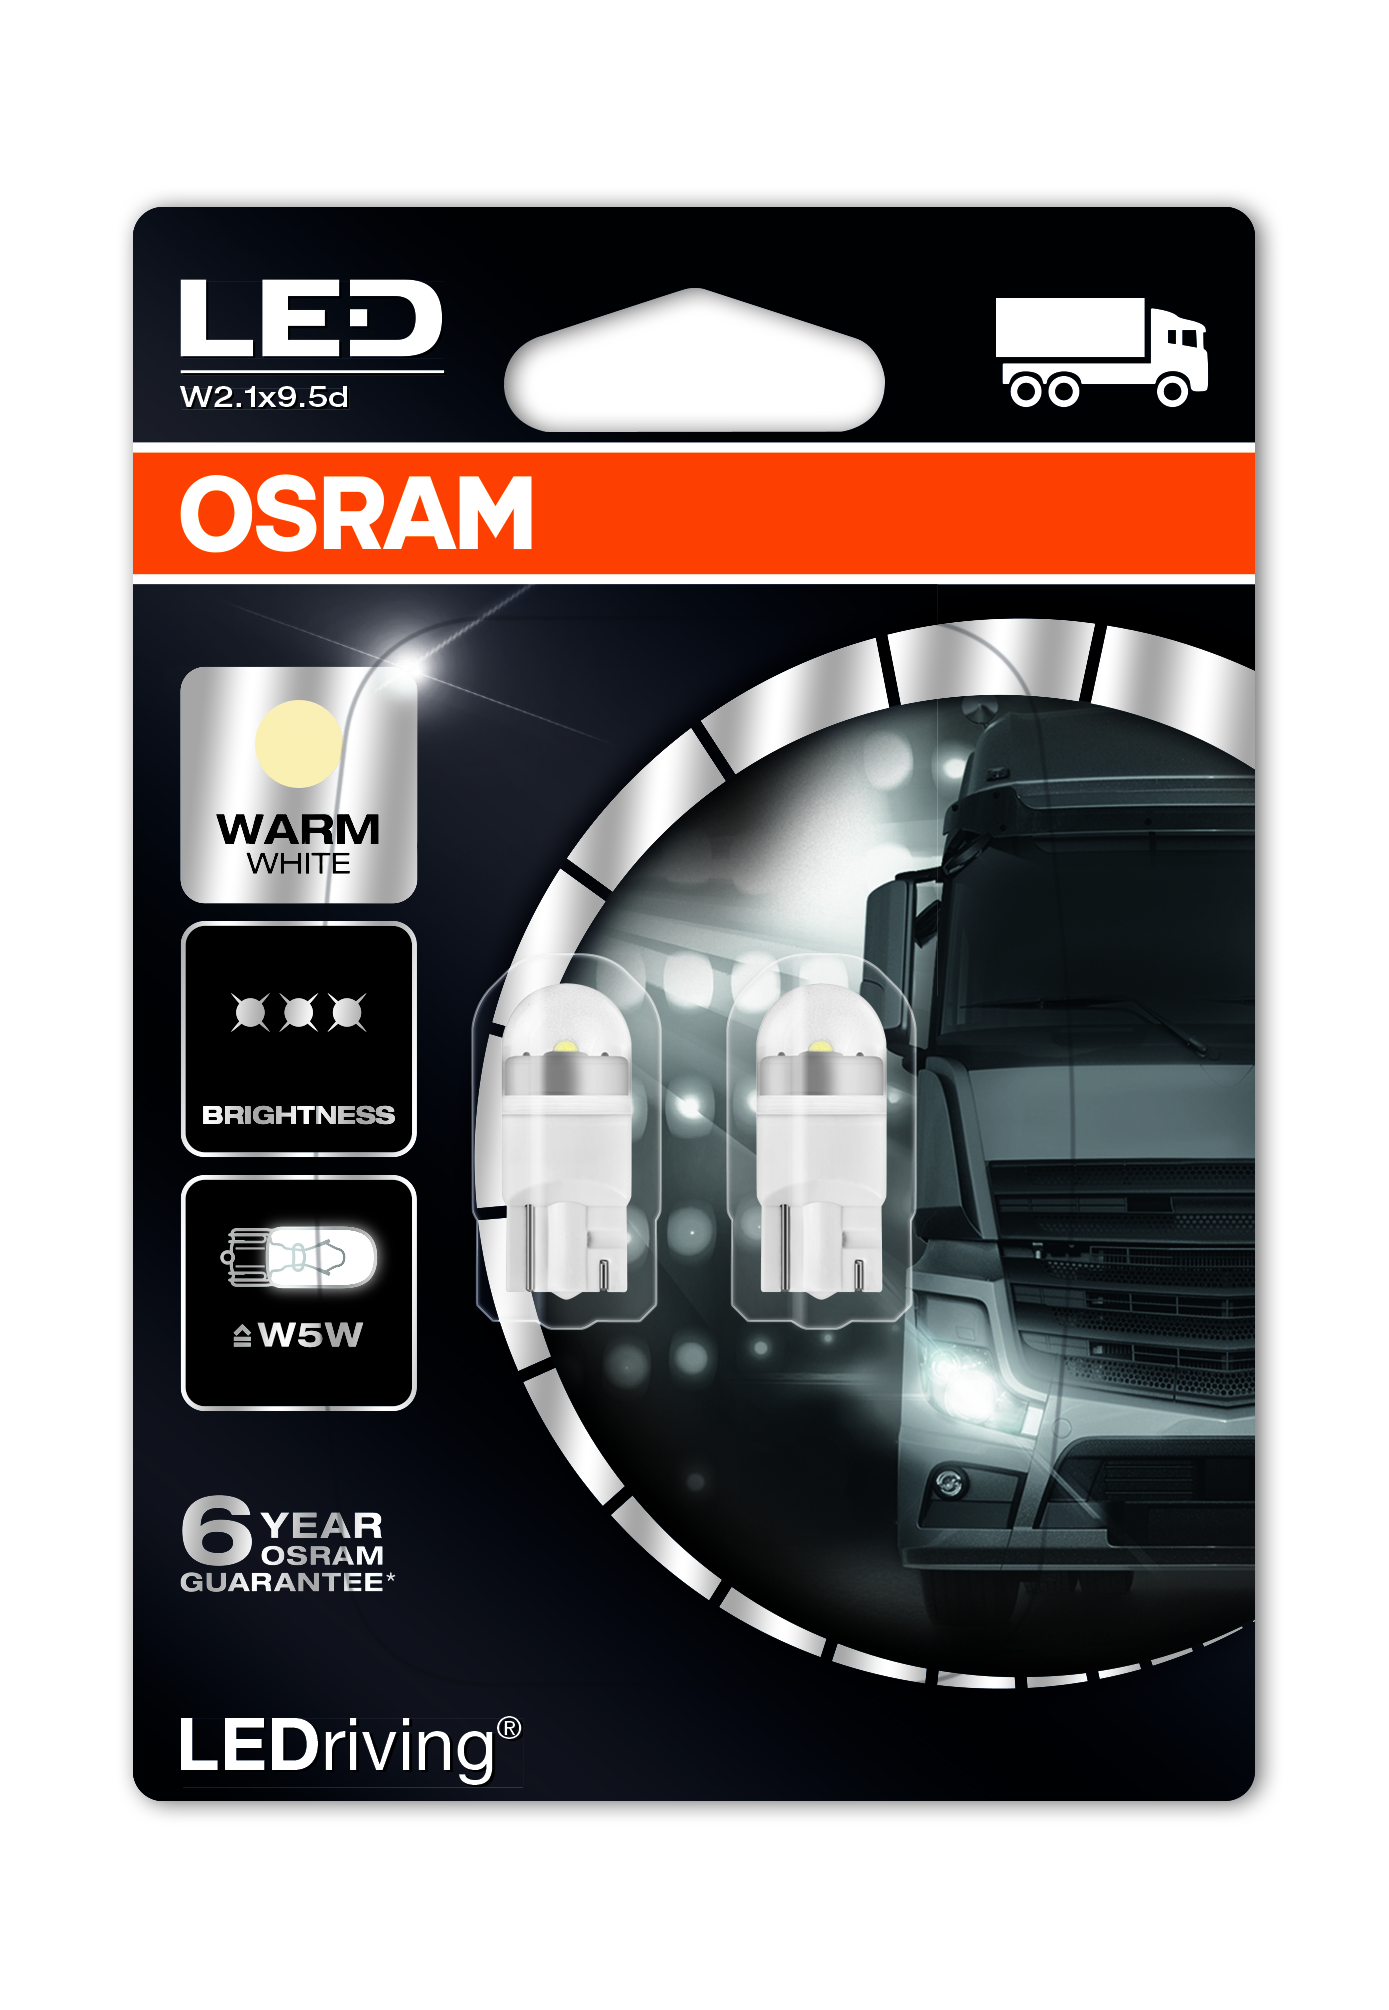 Osram LED, LEDriving Premium, W5W, W2,1x9,5d, 24V, 1W, 2824WW 4000K